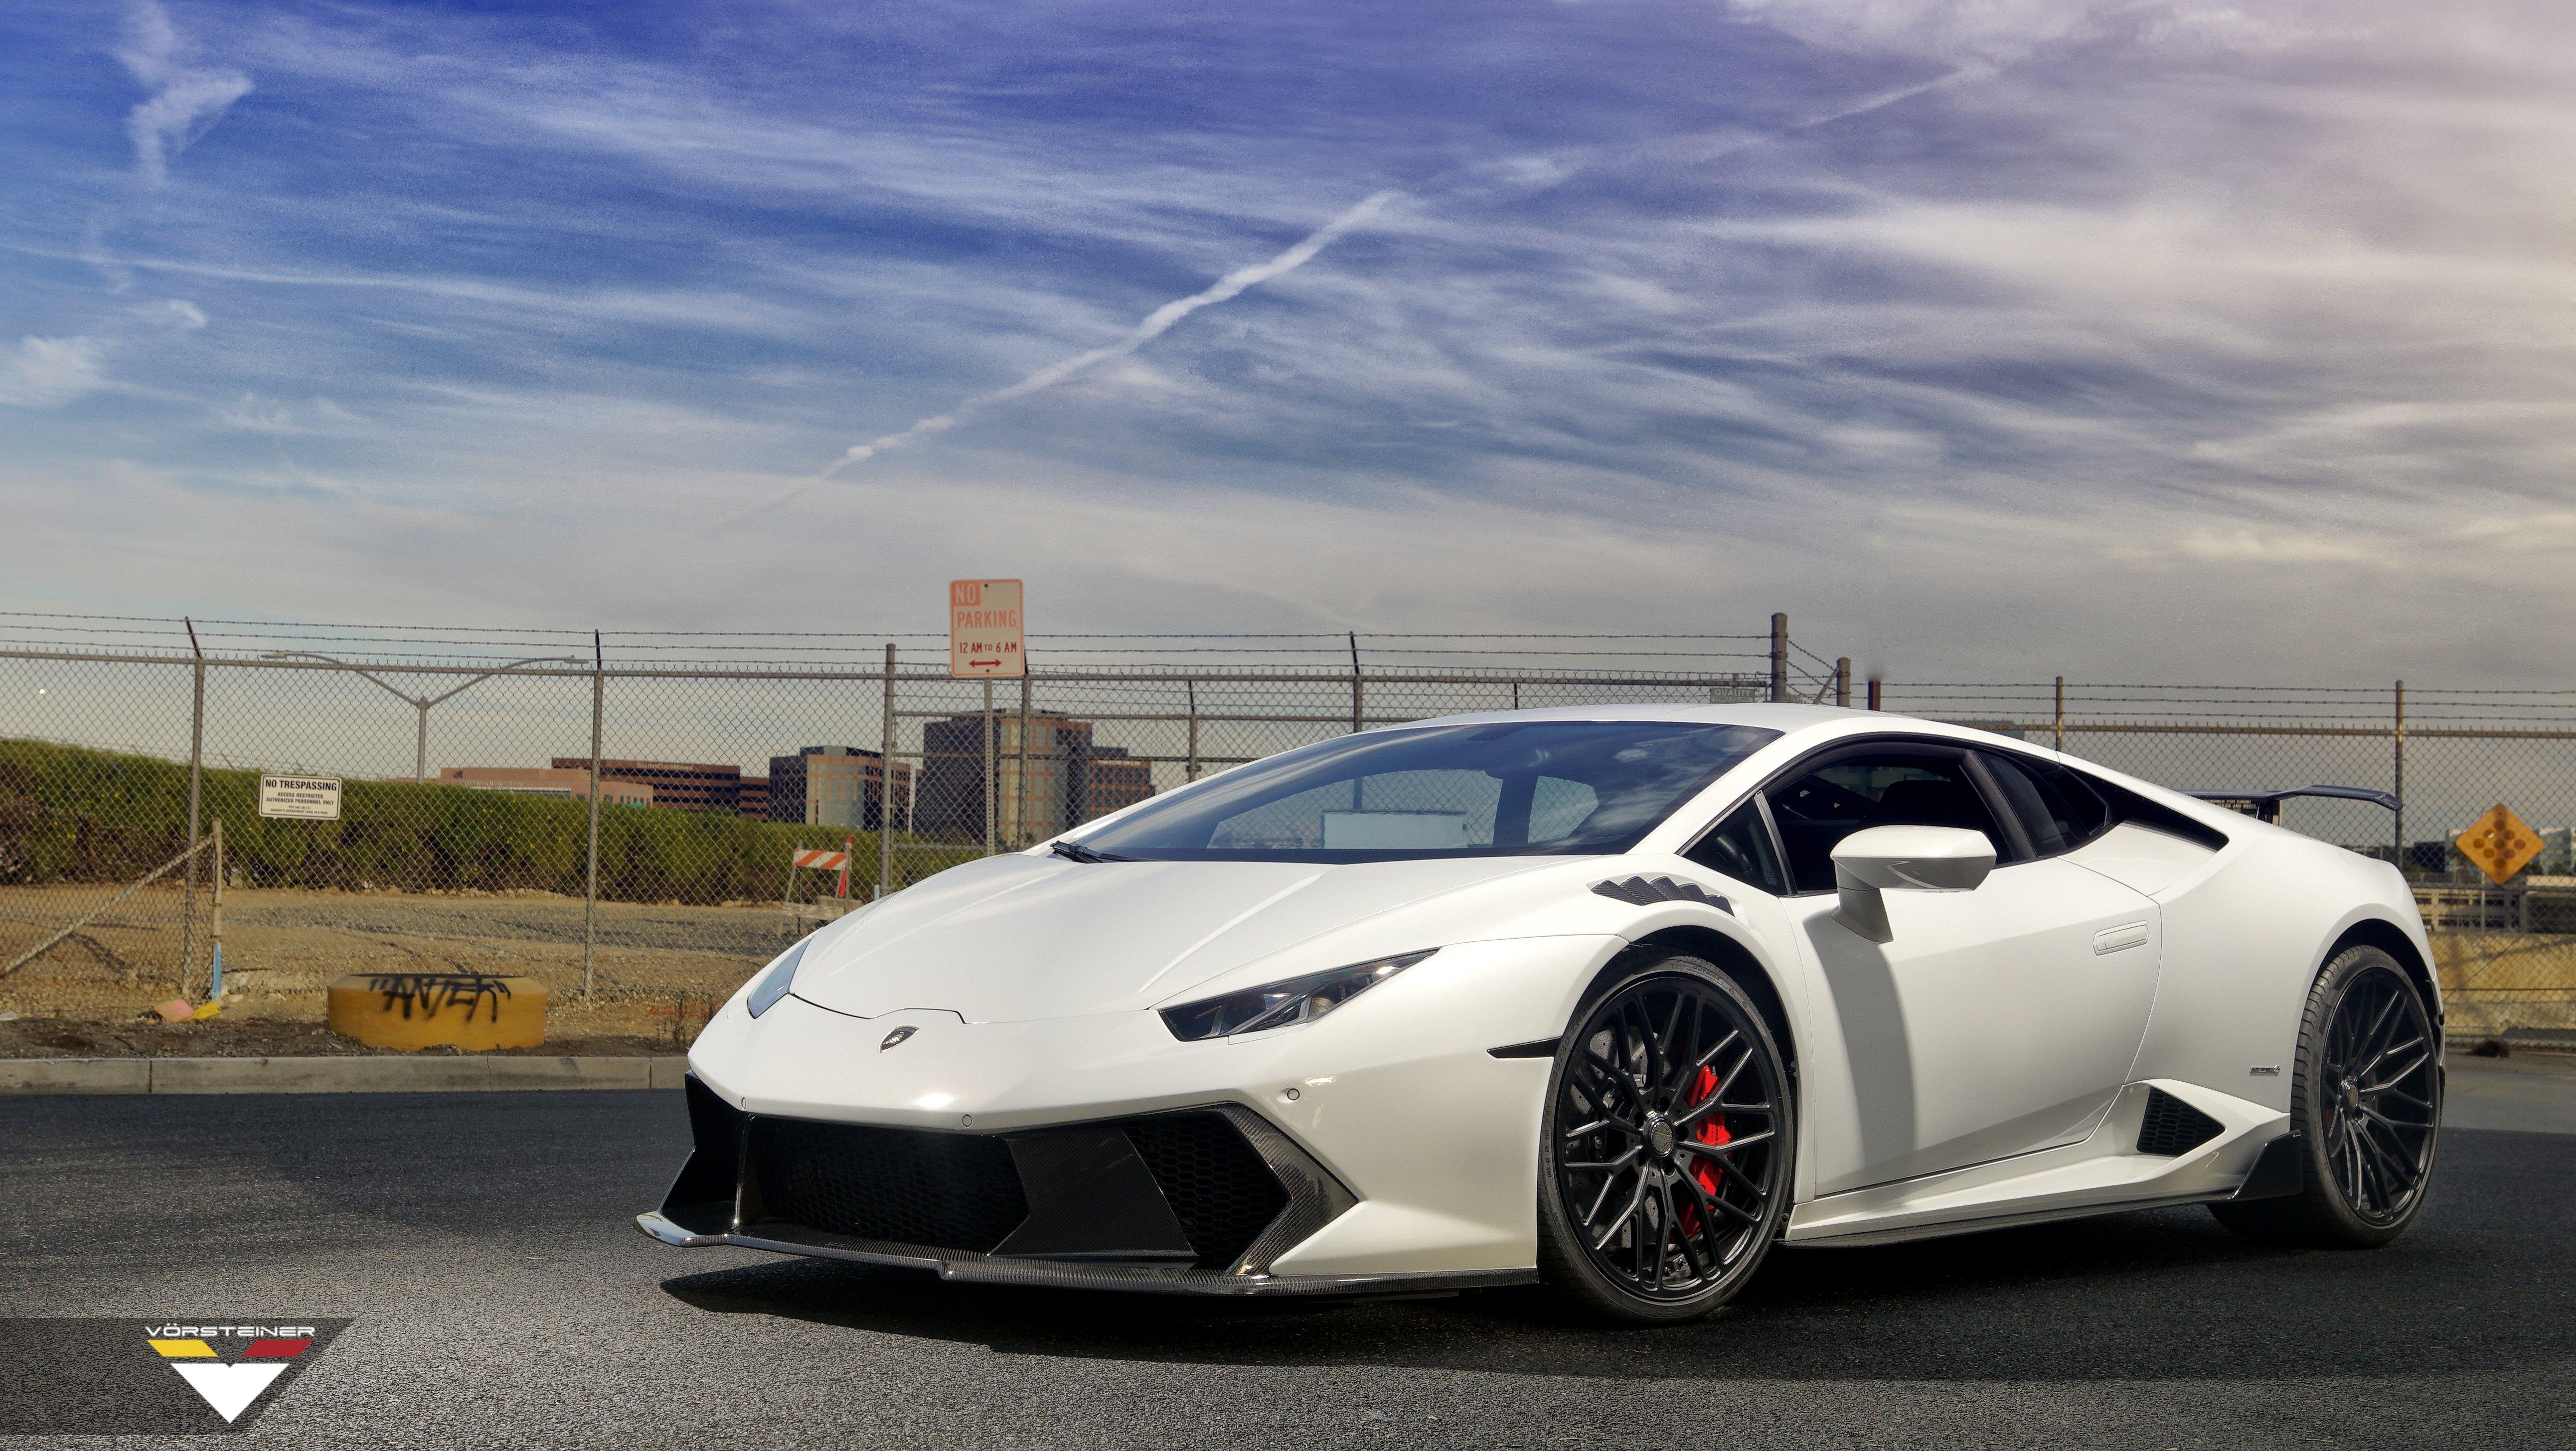 Superb Tuning Noticed on White Lamborghini Huracan — CARiD ... Lamborghini Huracan White